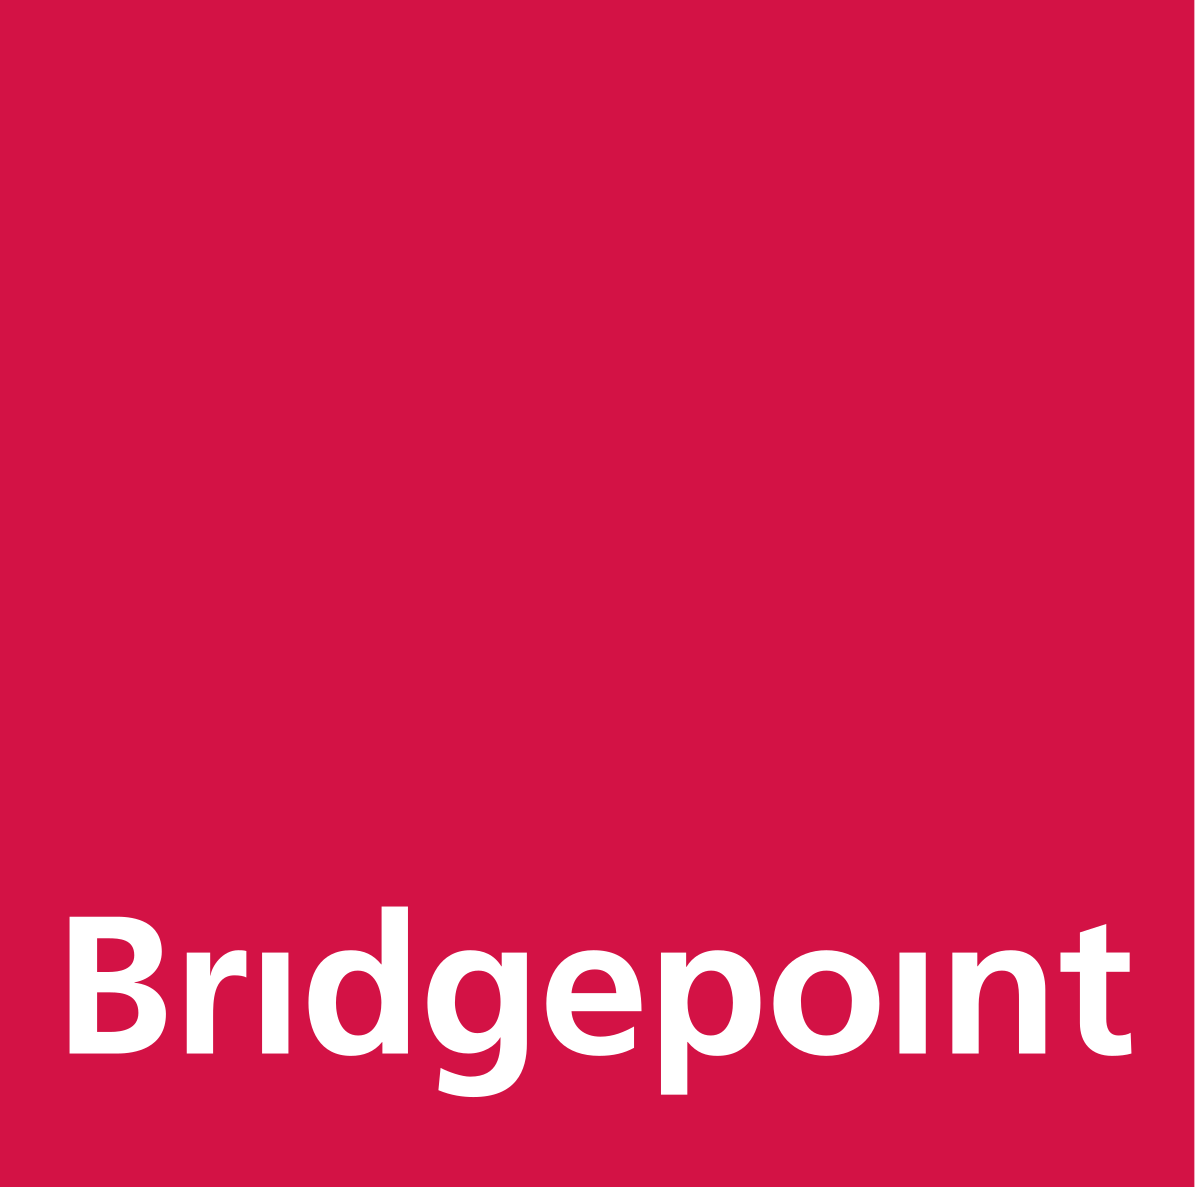 Bridgepoint Capital.